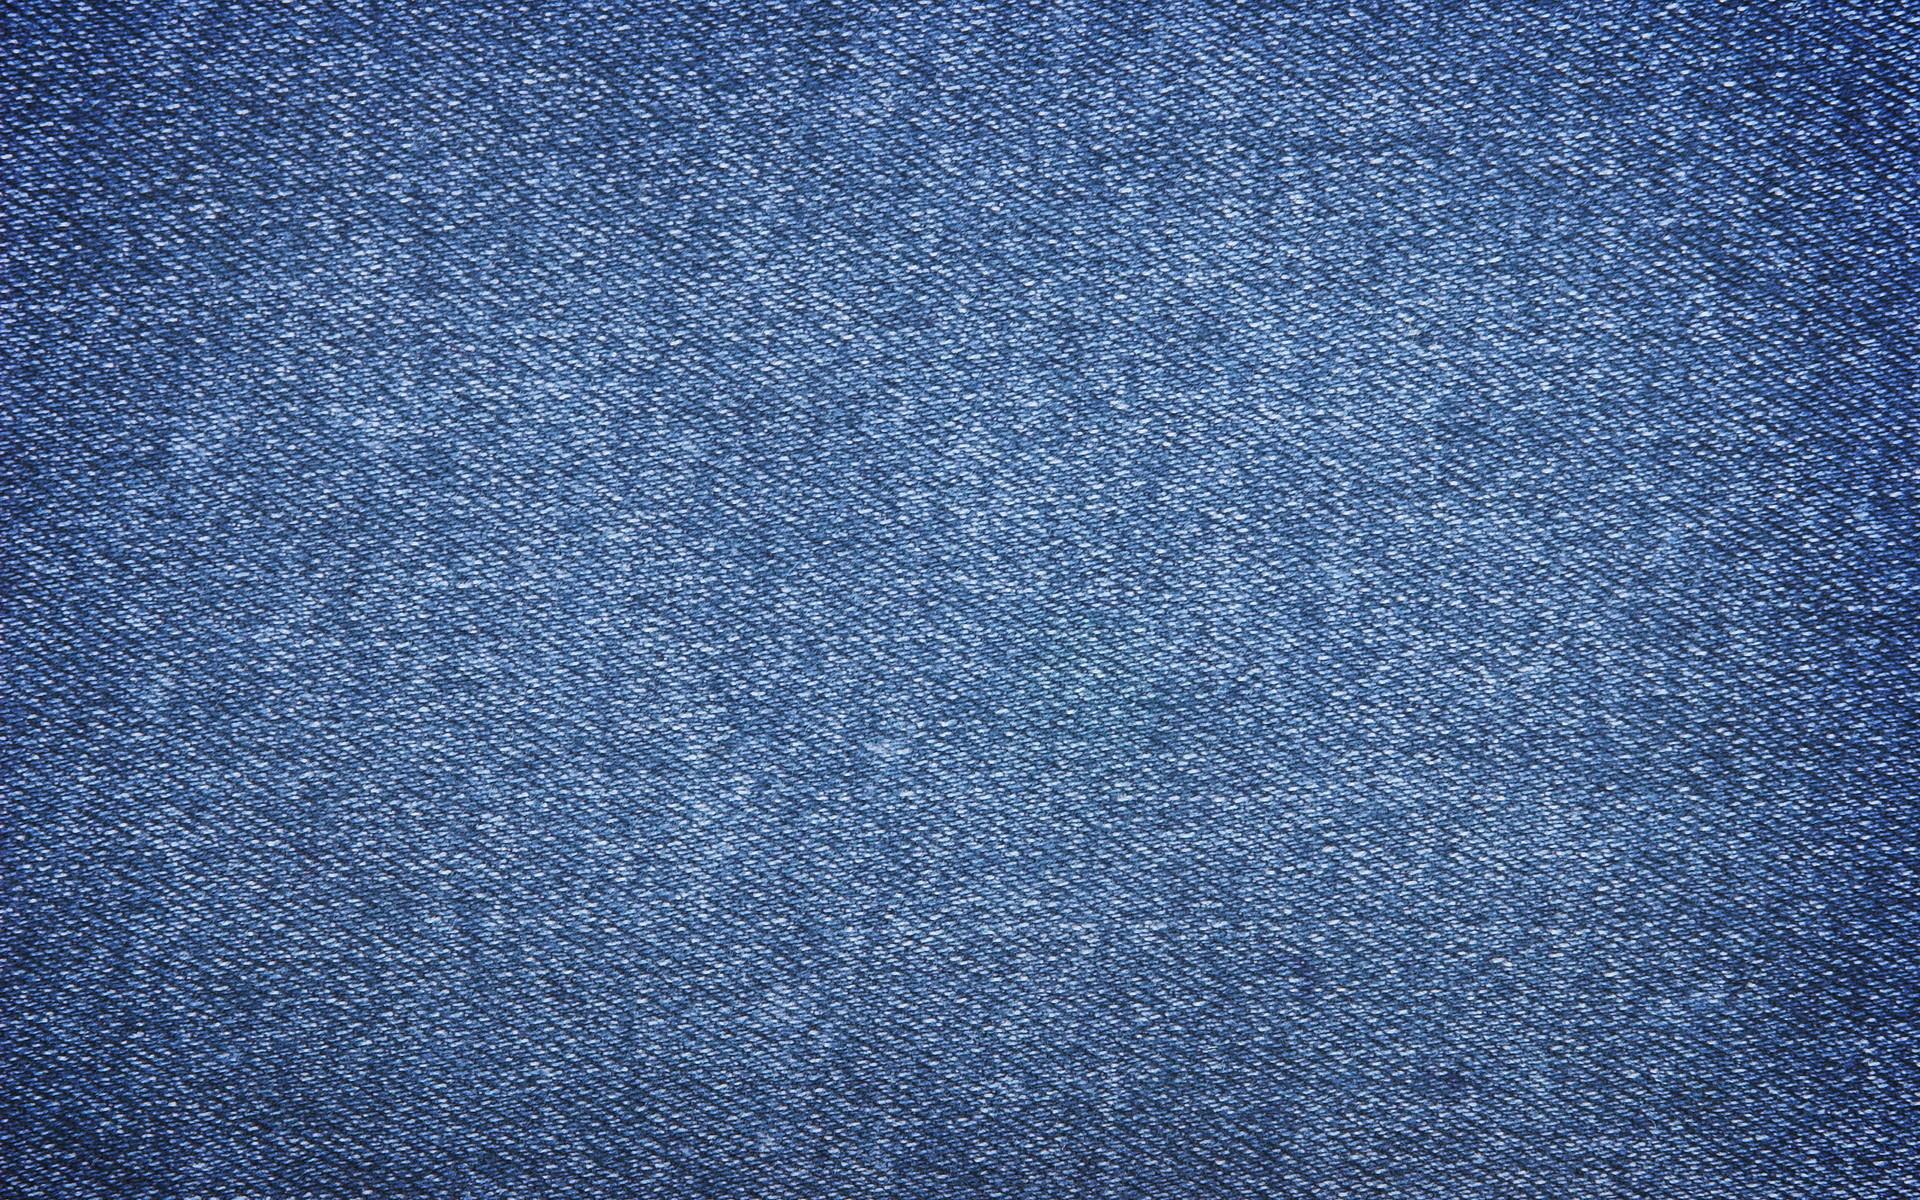 1080x1920 Light Blue Pattern IPhone 6 Plus HD Wallpaper